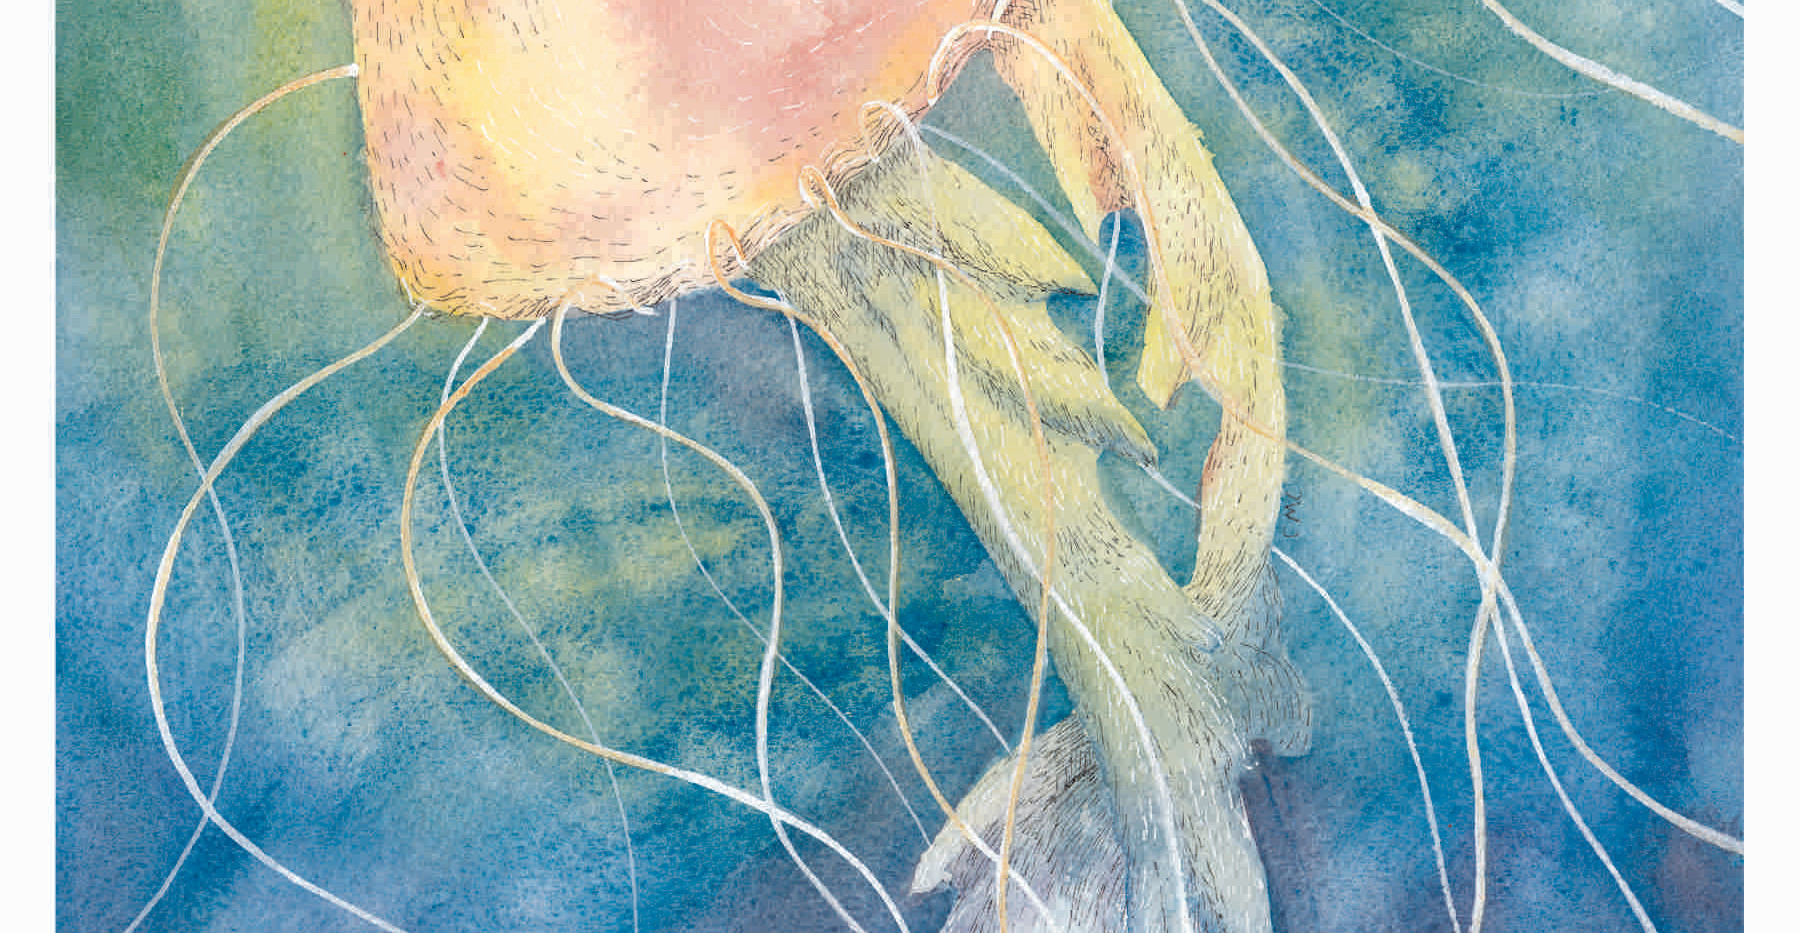 Jellyfish_Thumb.jpg